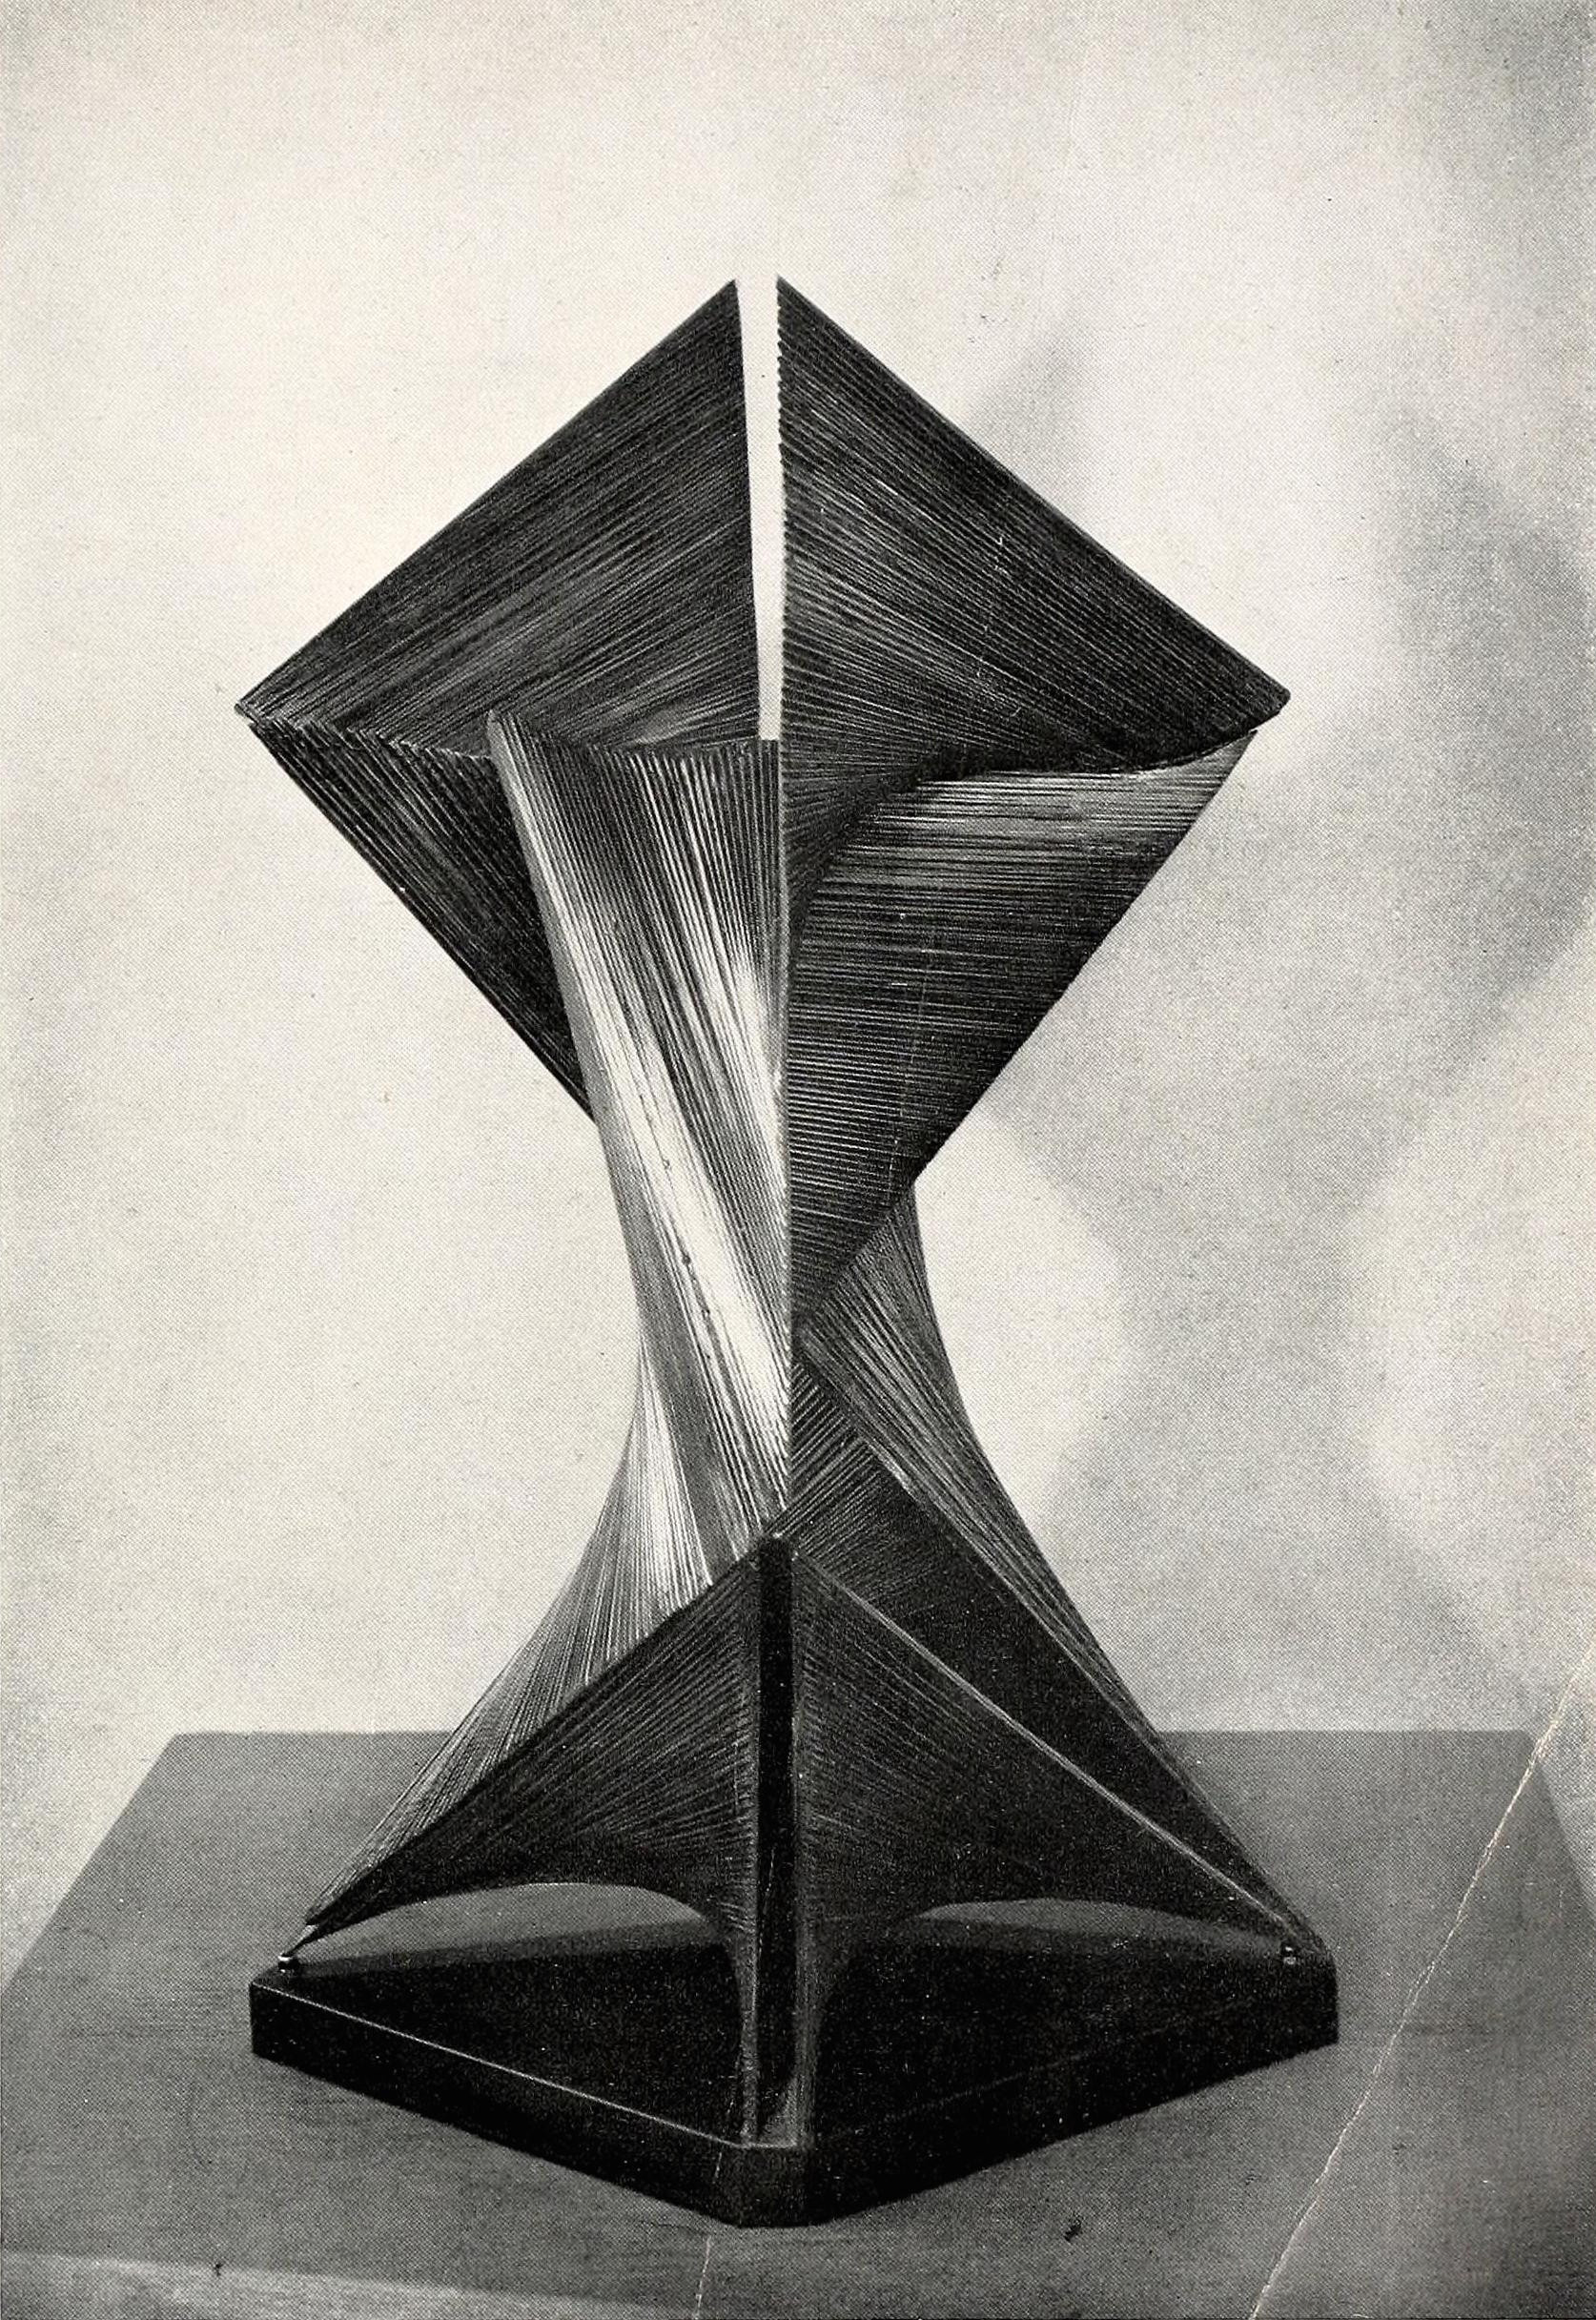 "Antoine Pevsner, developable surface (1938), Oxidized bronze on slate base, 25,5"" high"